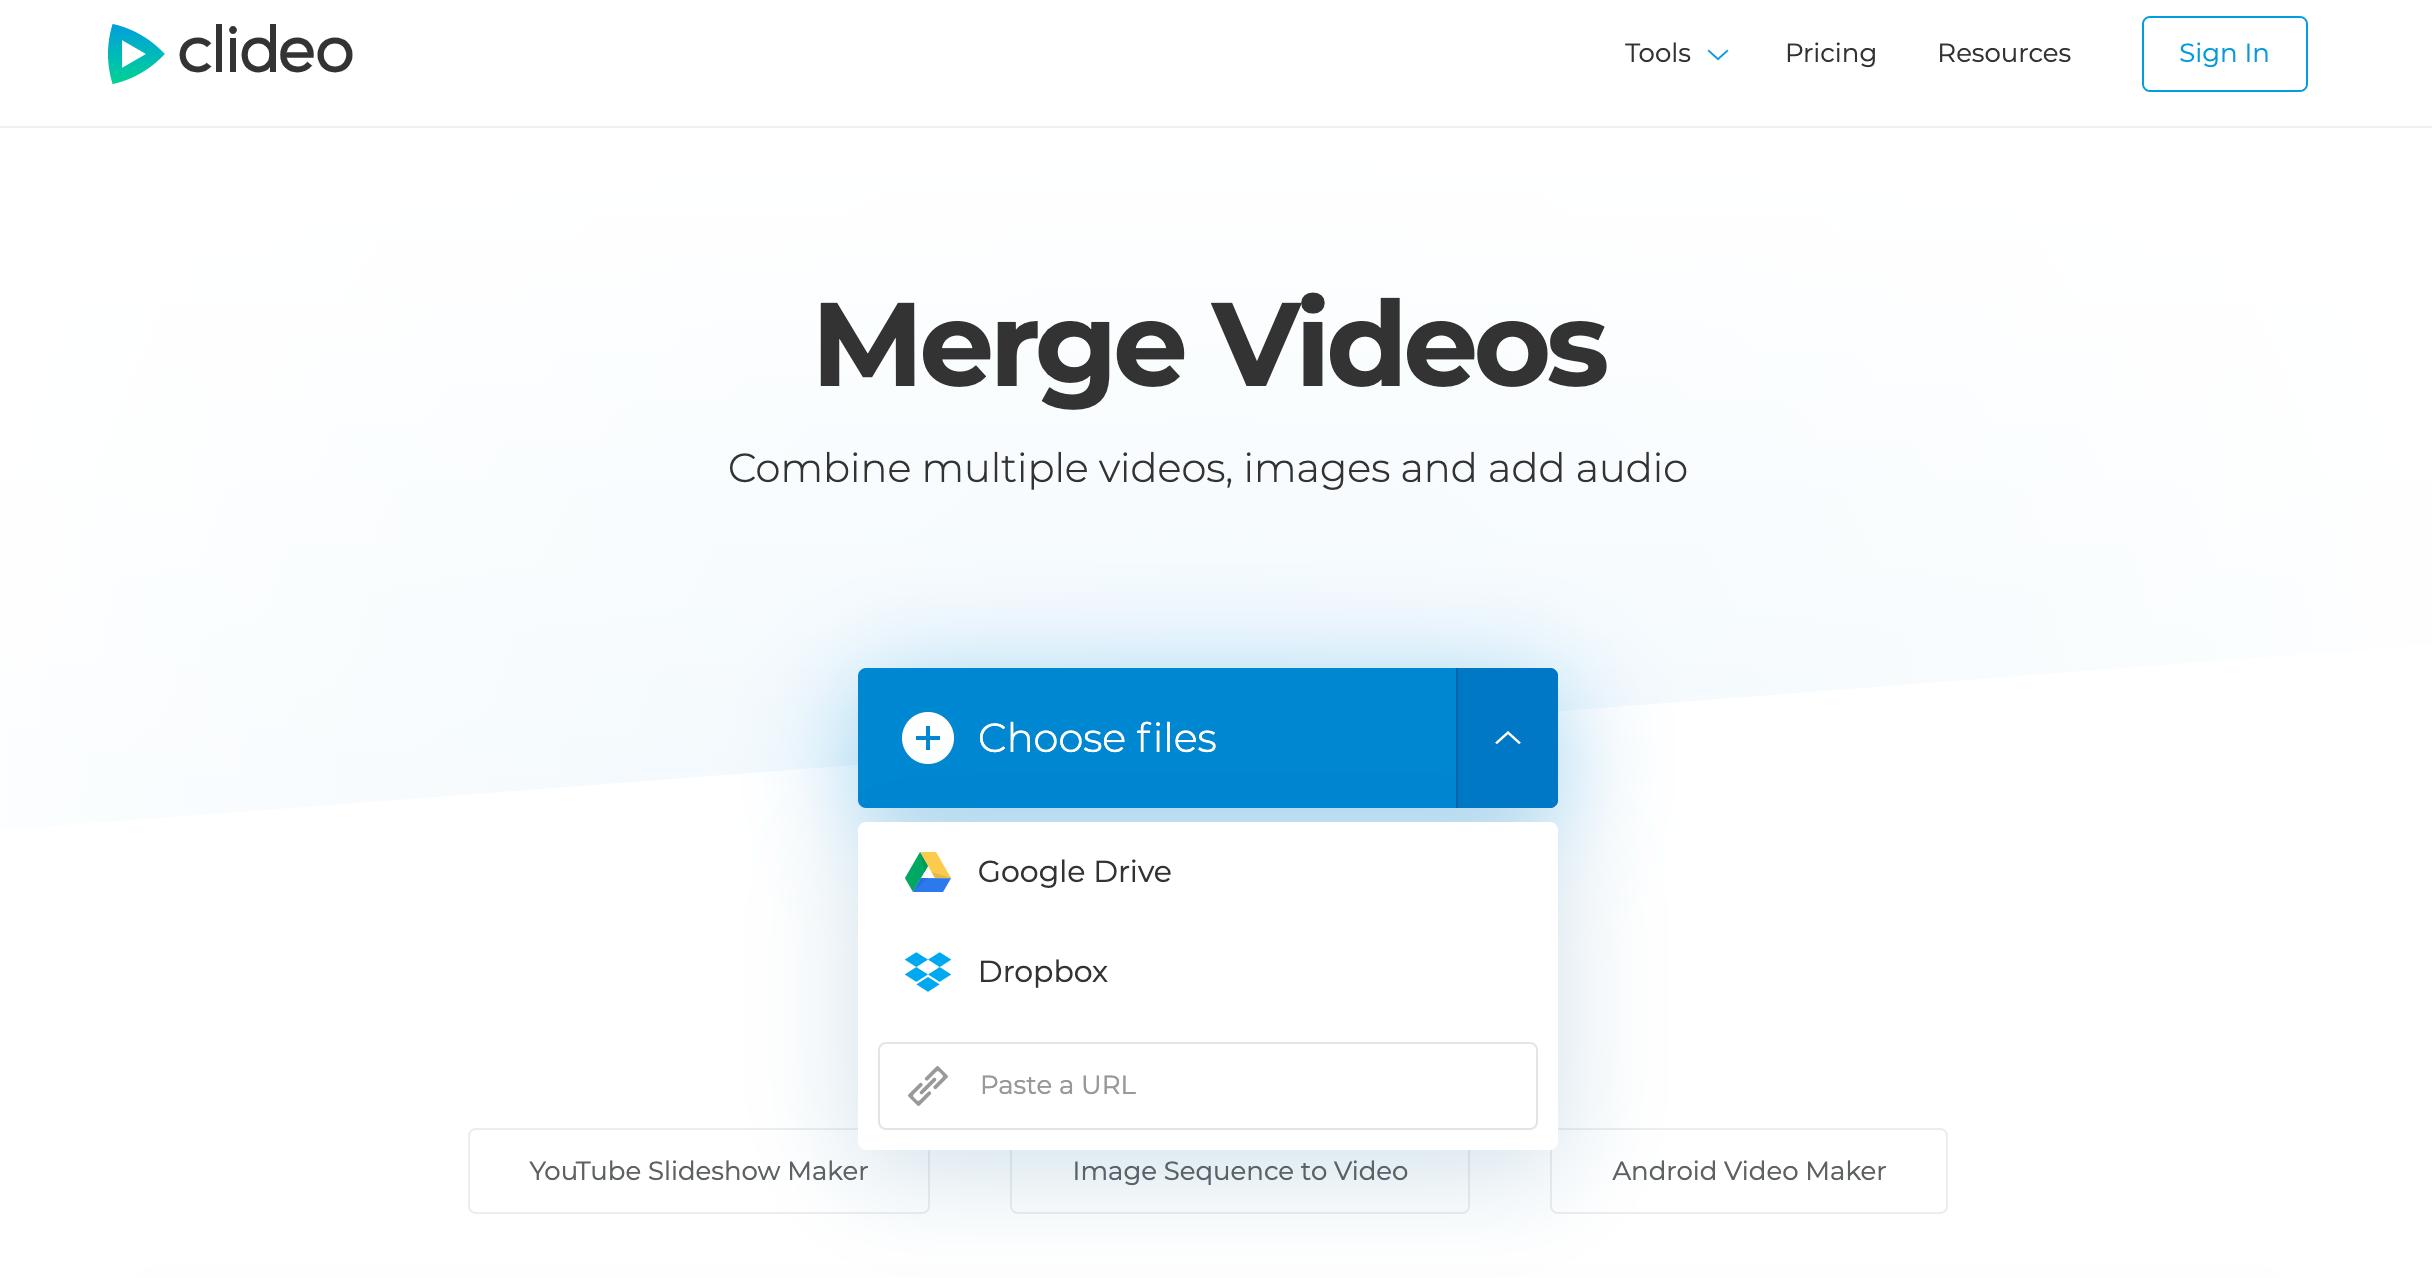 Upload videos to merge on Windows